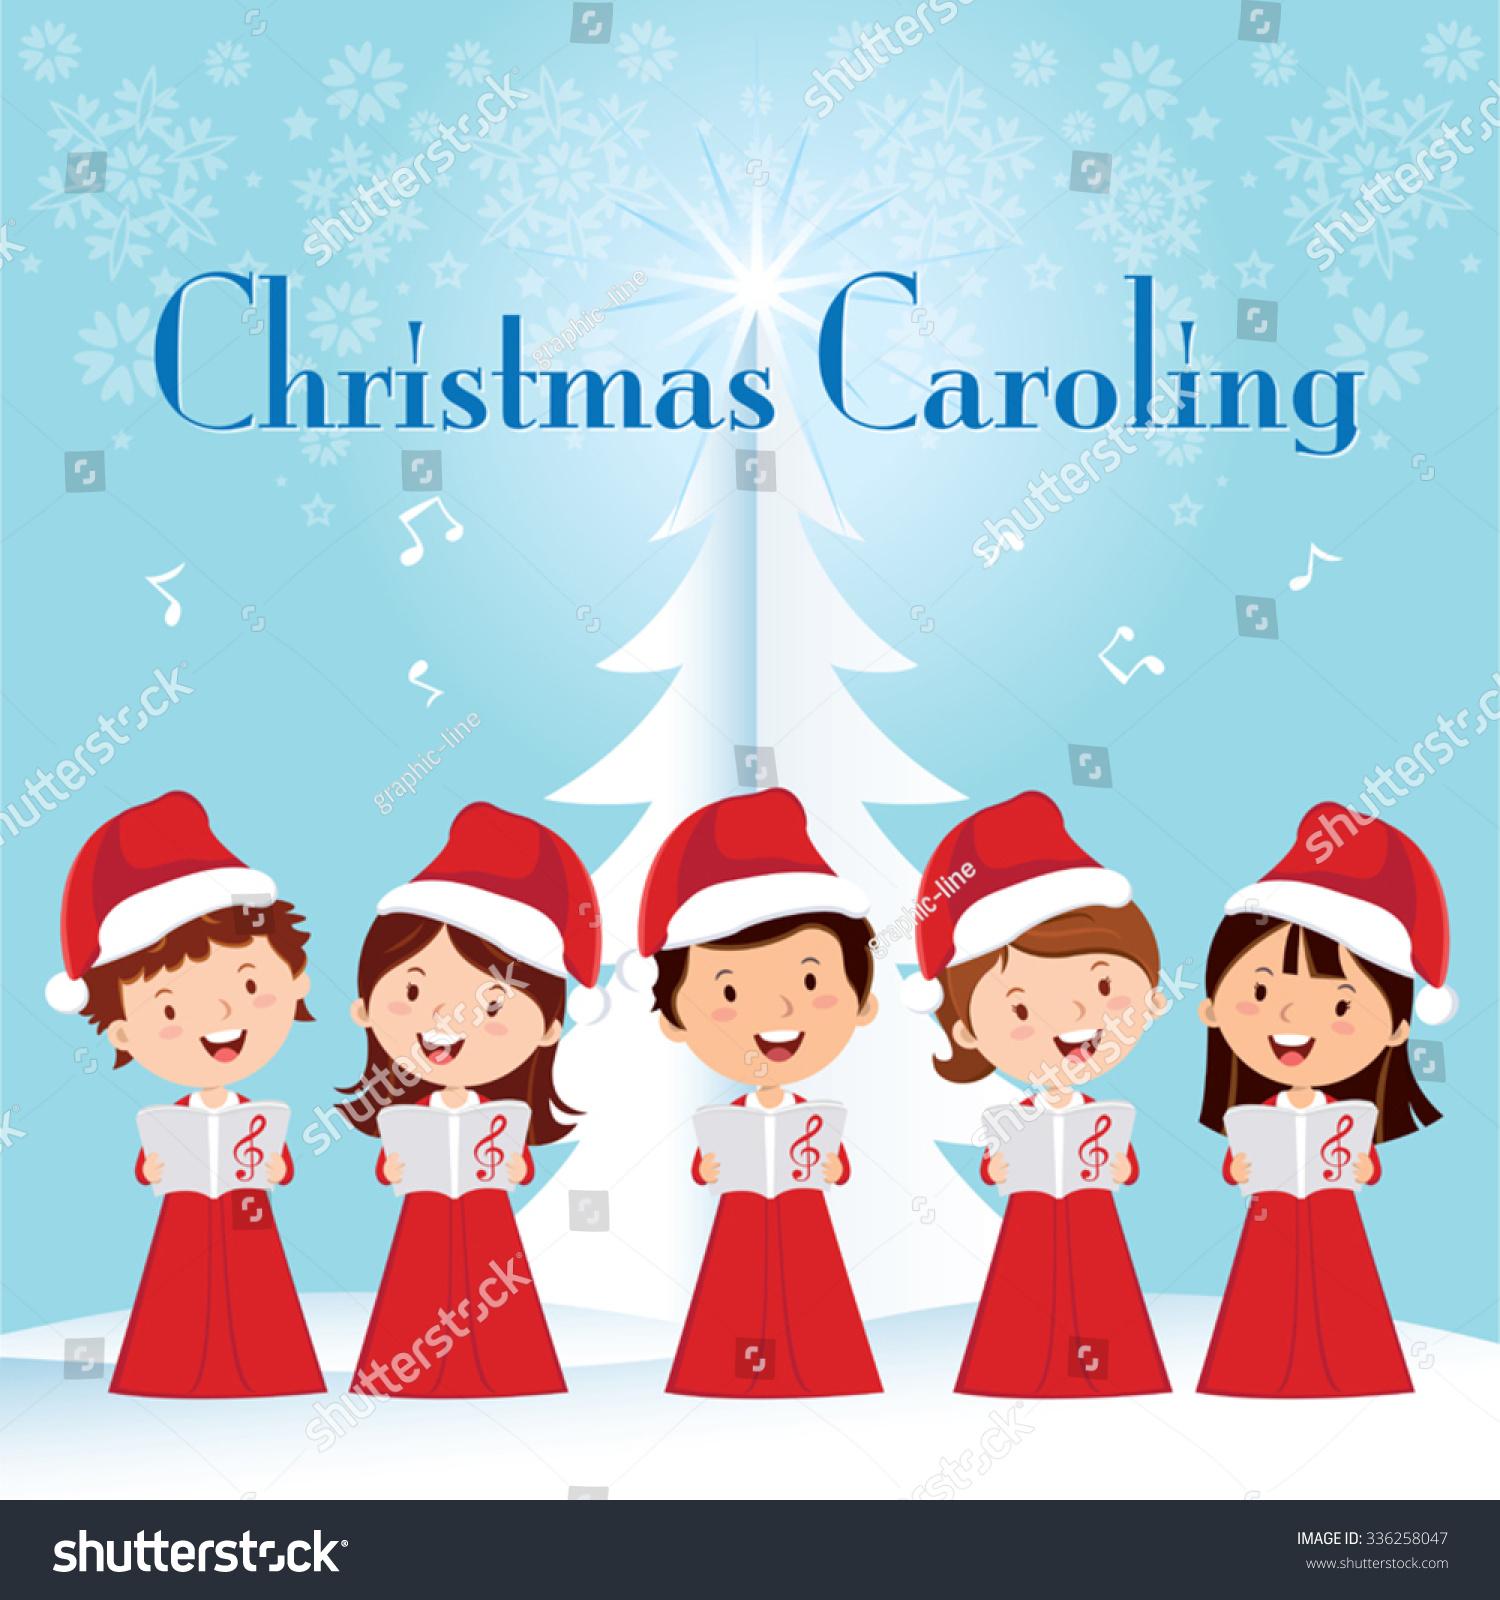 How to carol, Christmas carols for children 24